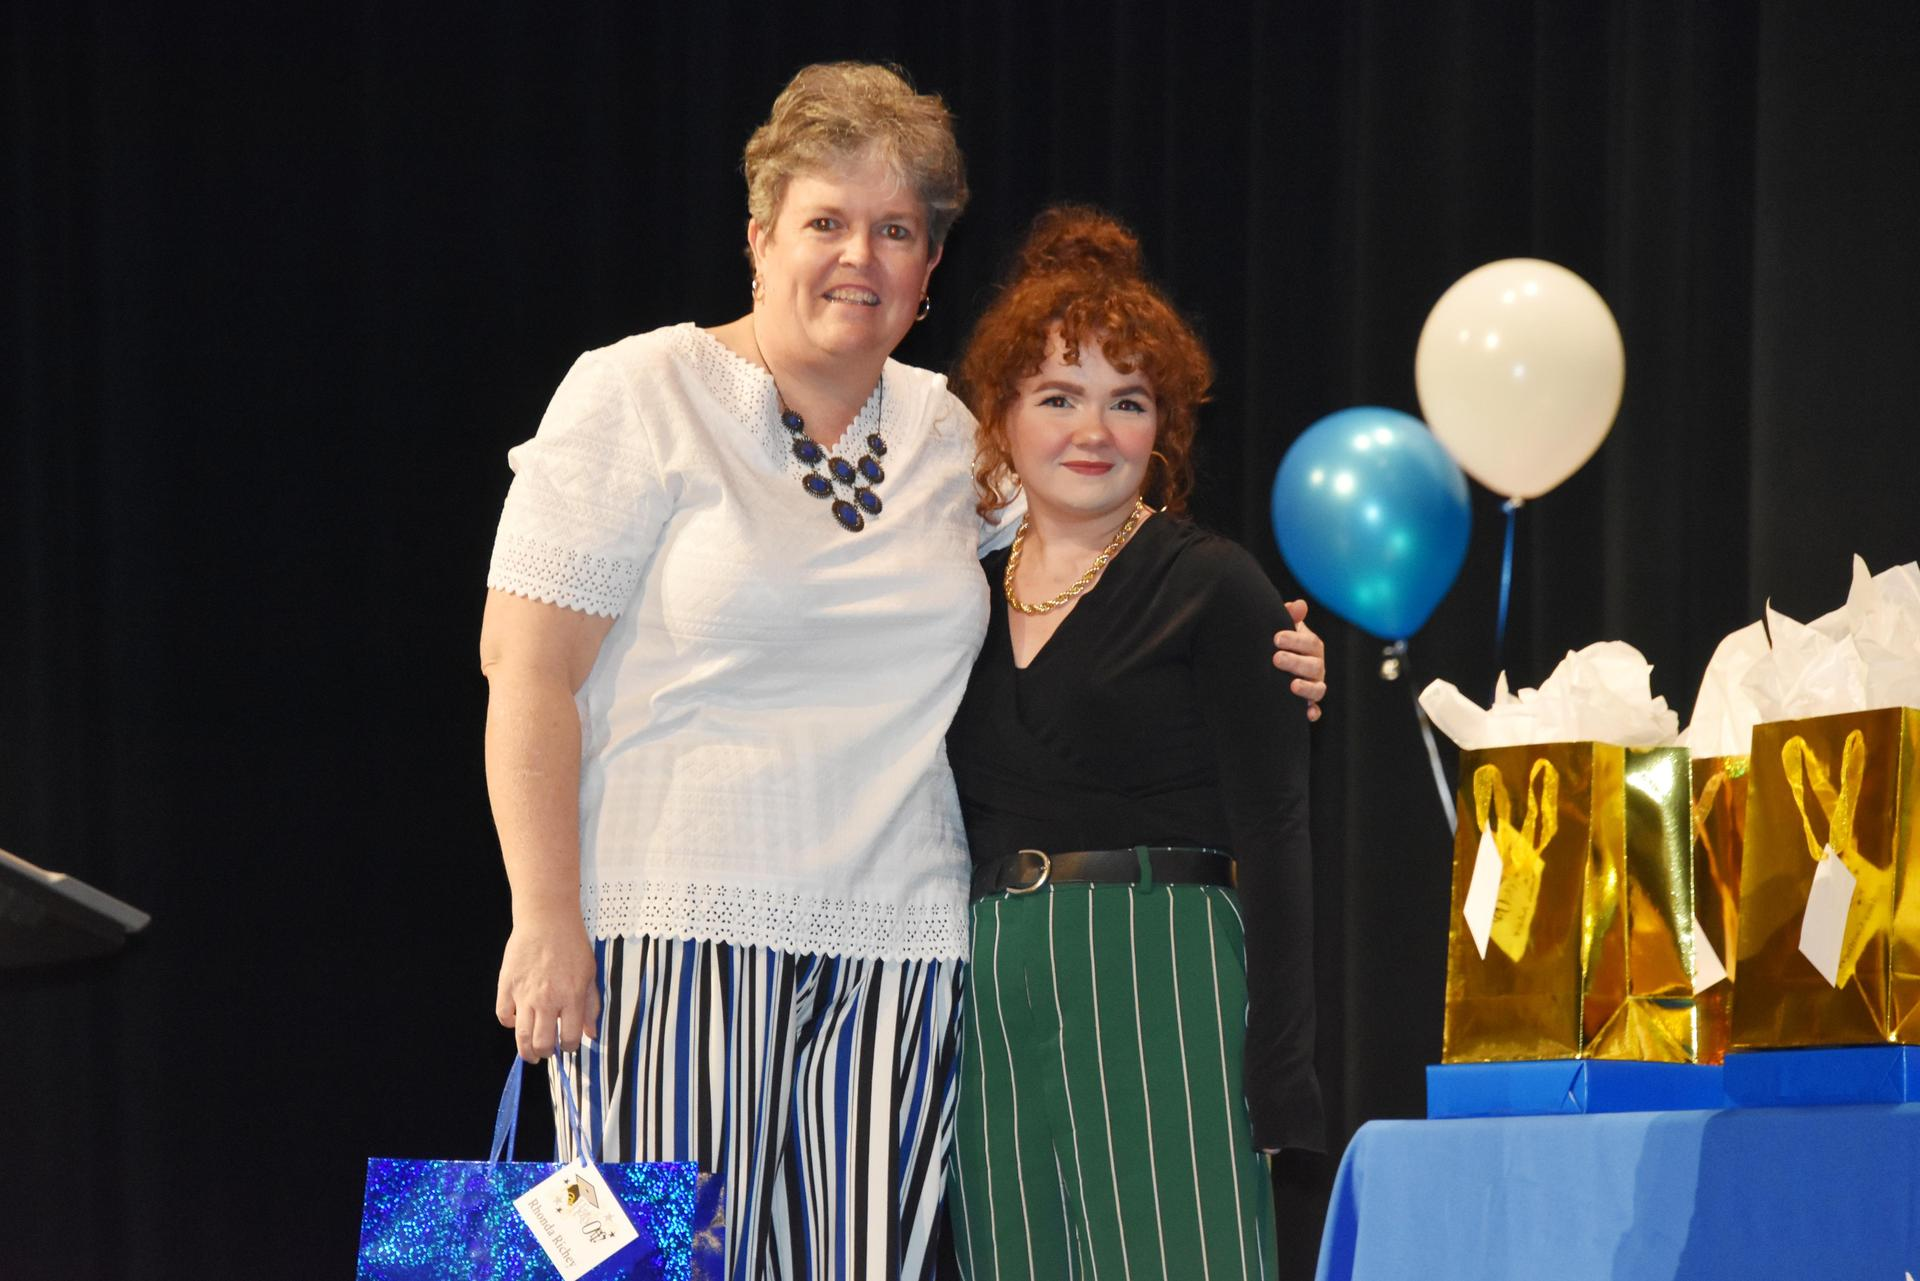 Kayle Richey and Rhonda Richey